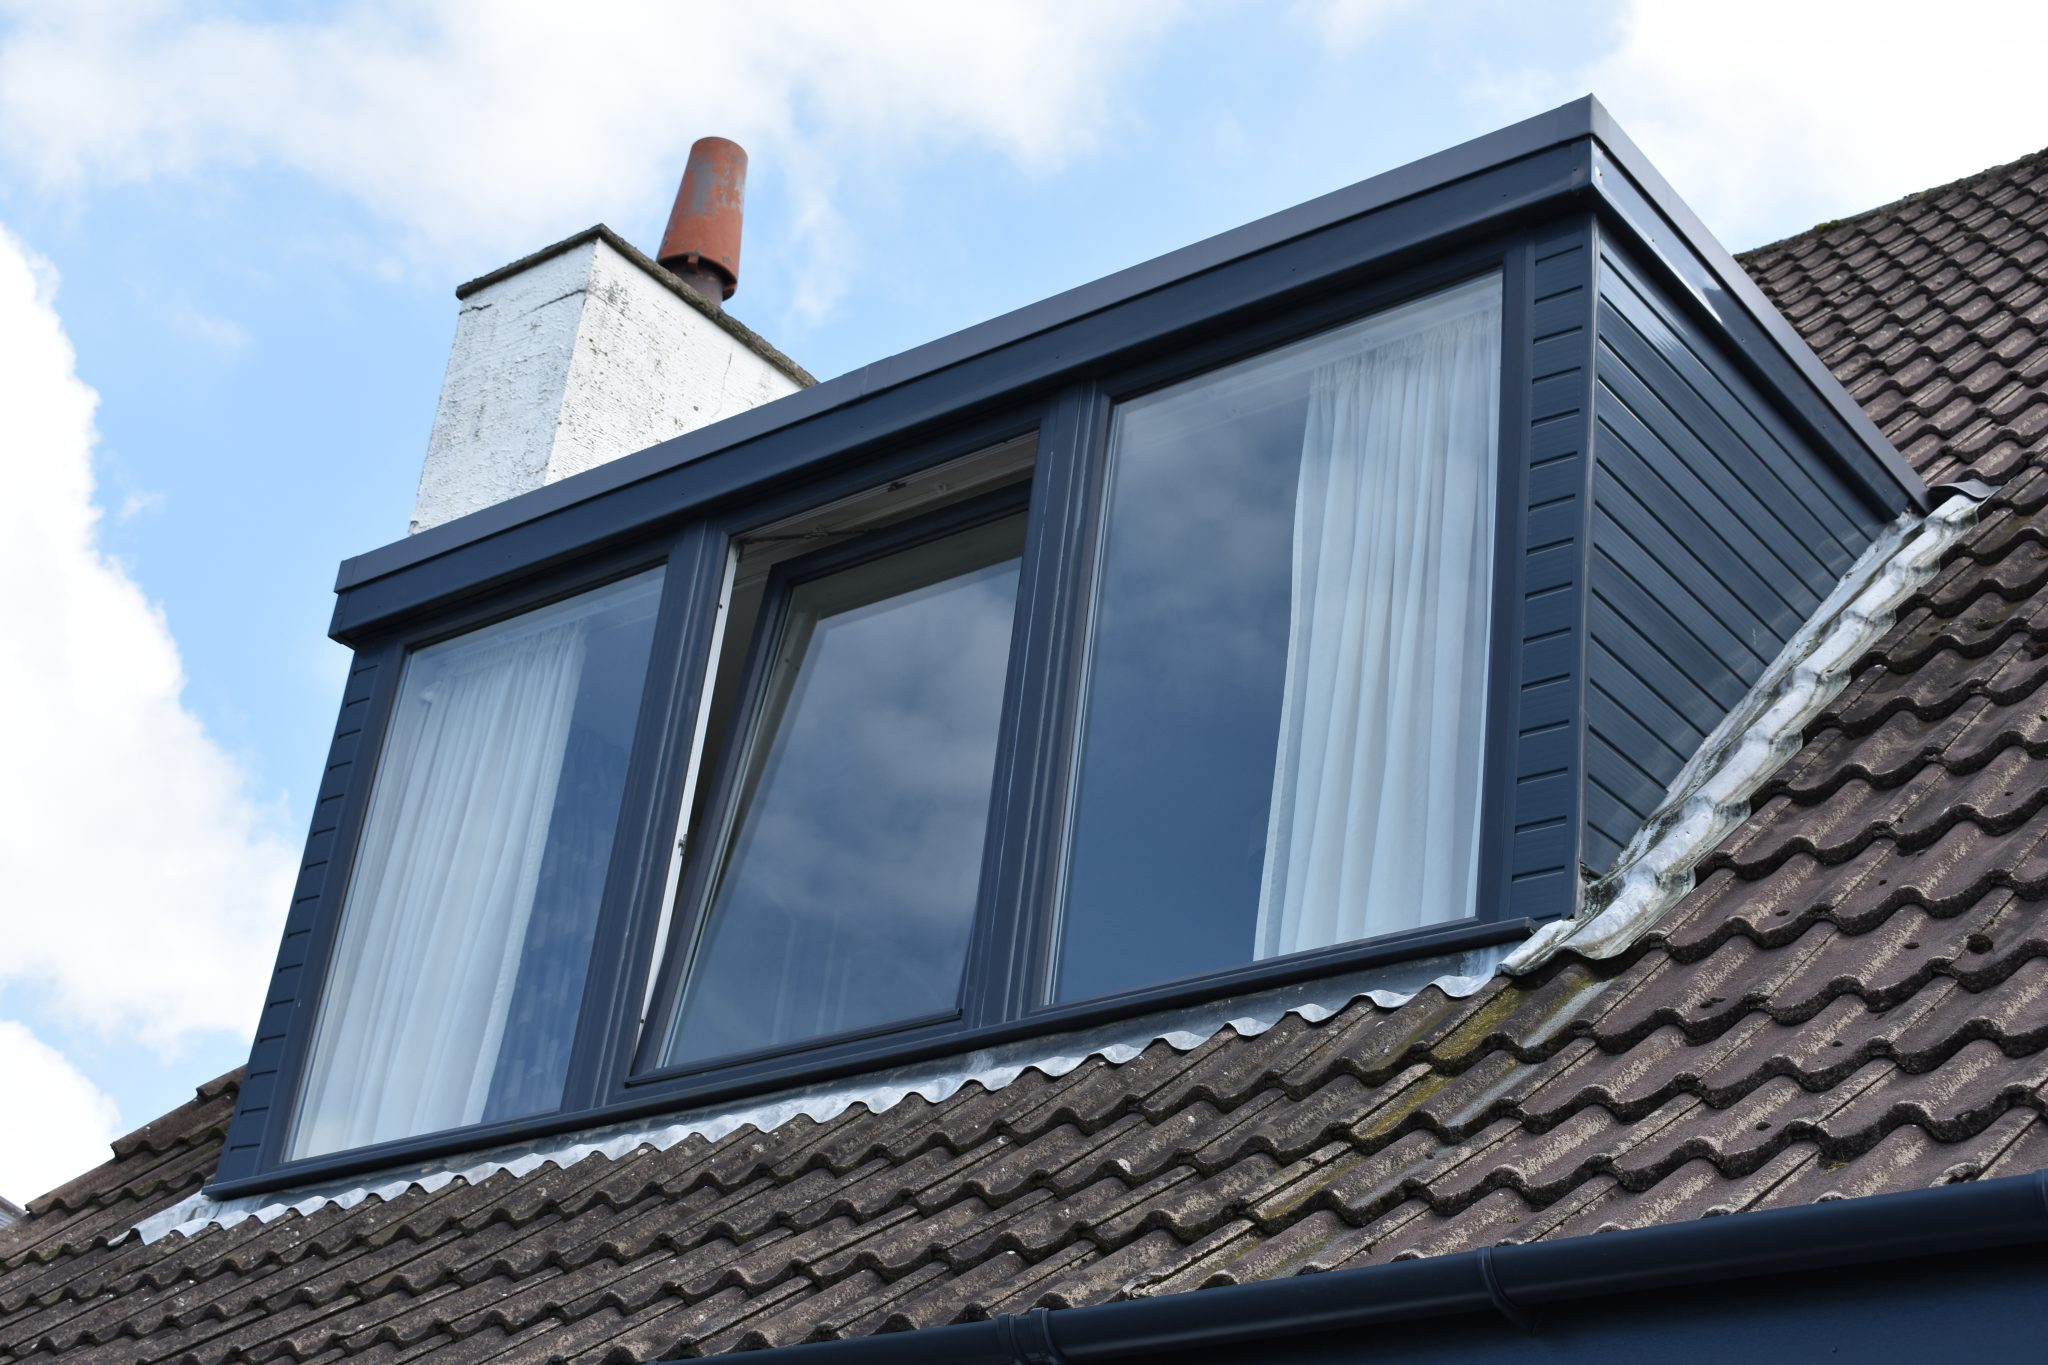 Dormer window cultra